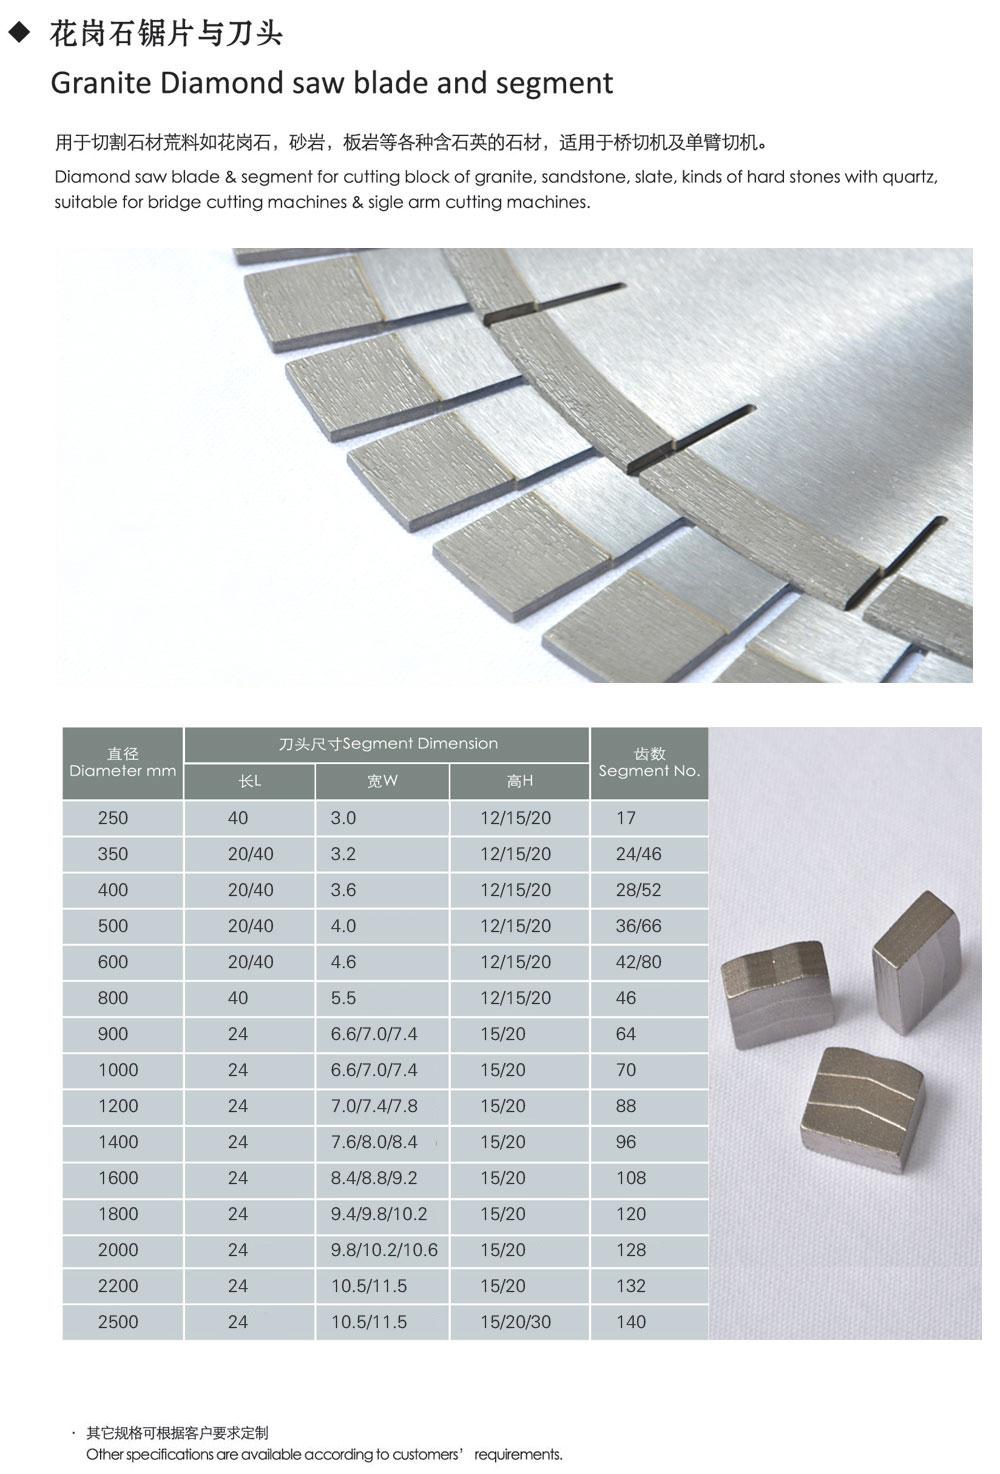 Granite Diamond saw blade and segment